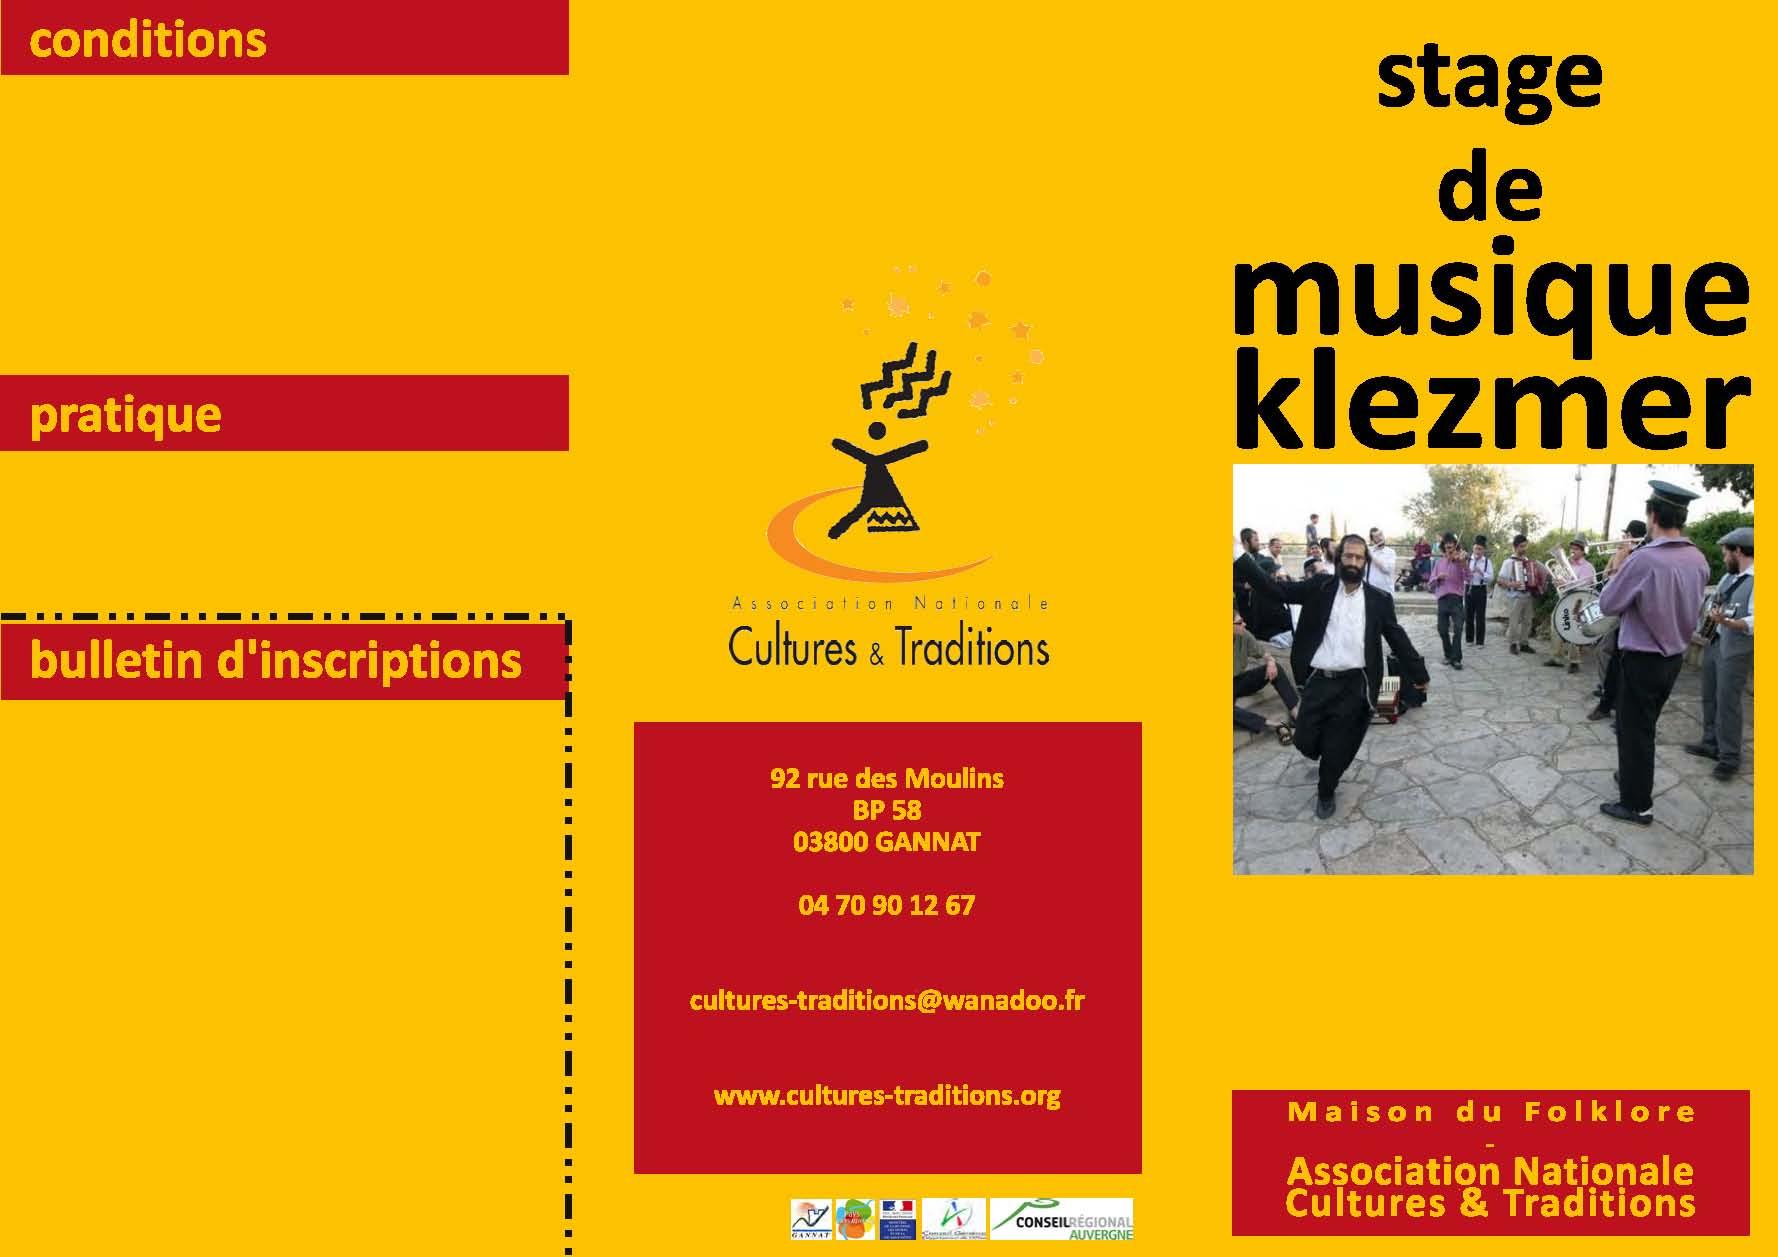 depliant_stage_klezmer_couleurs_page_1.jpg